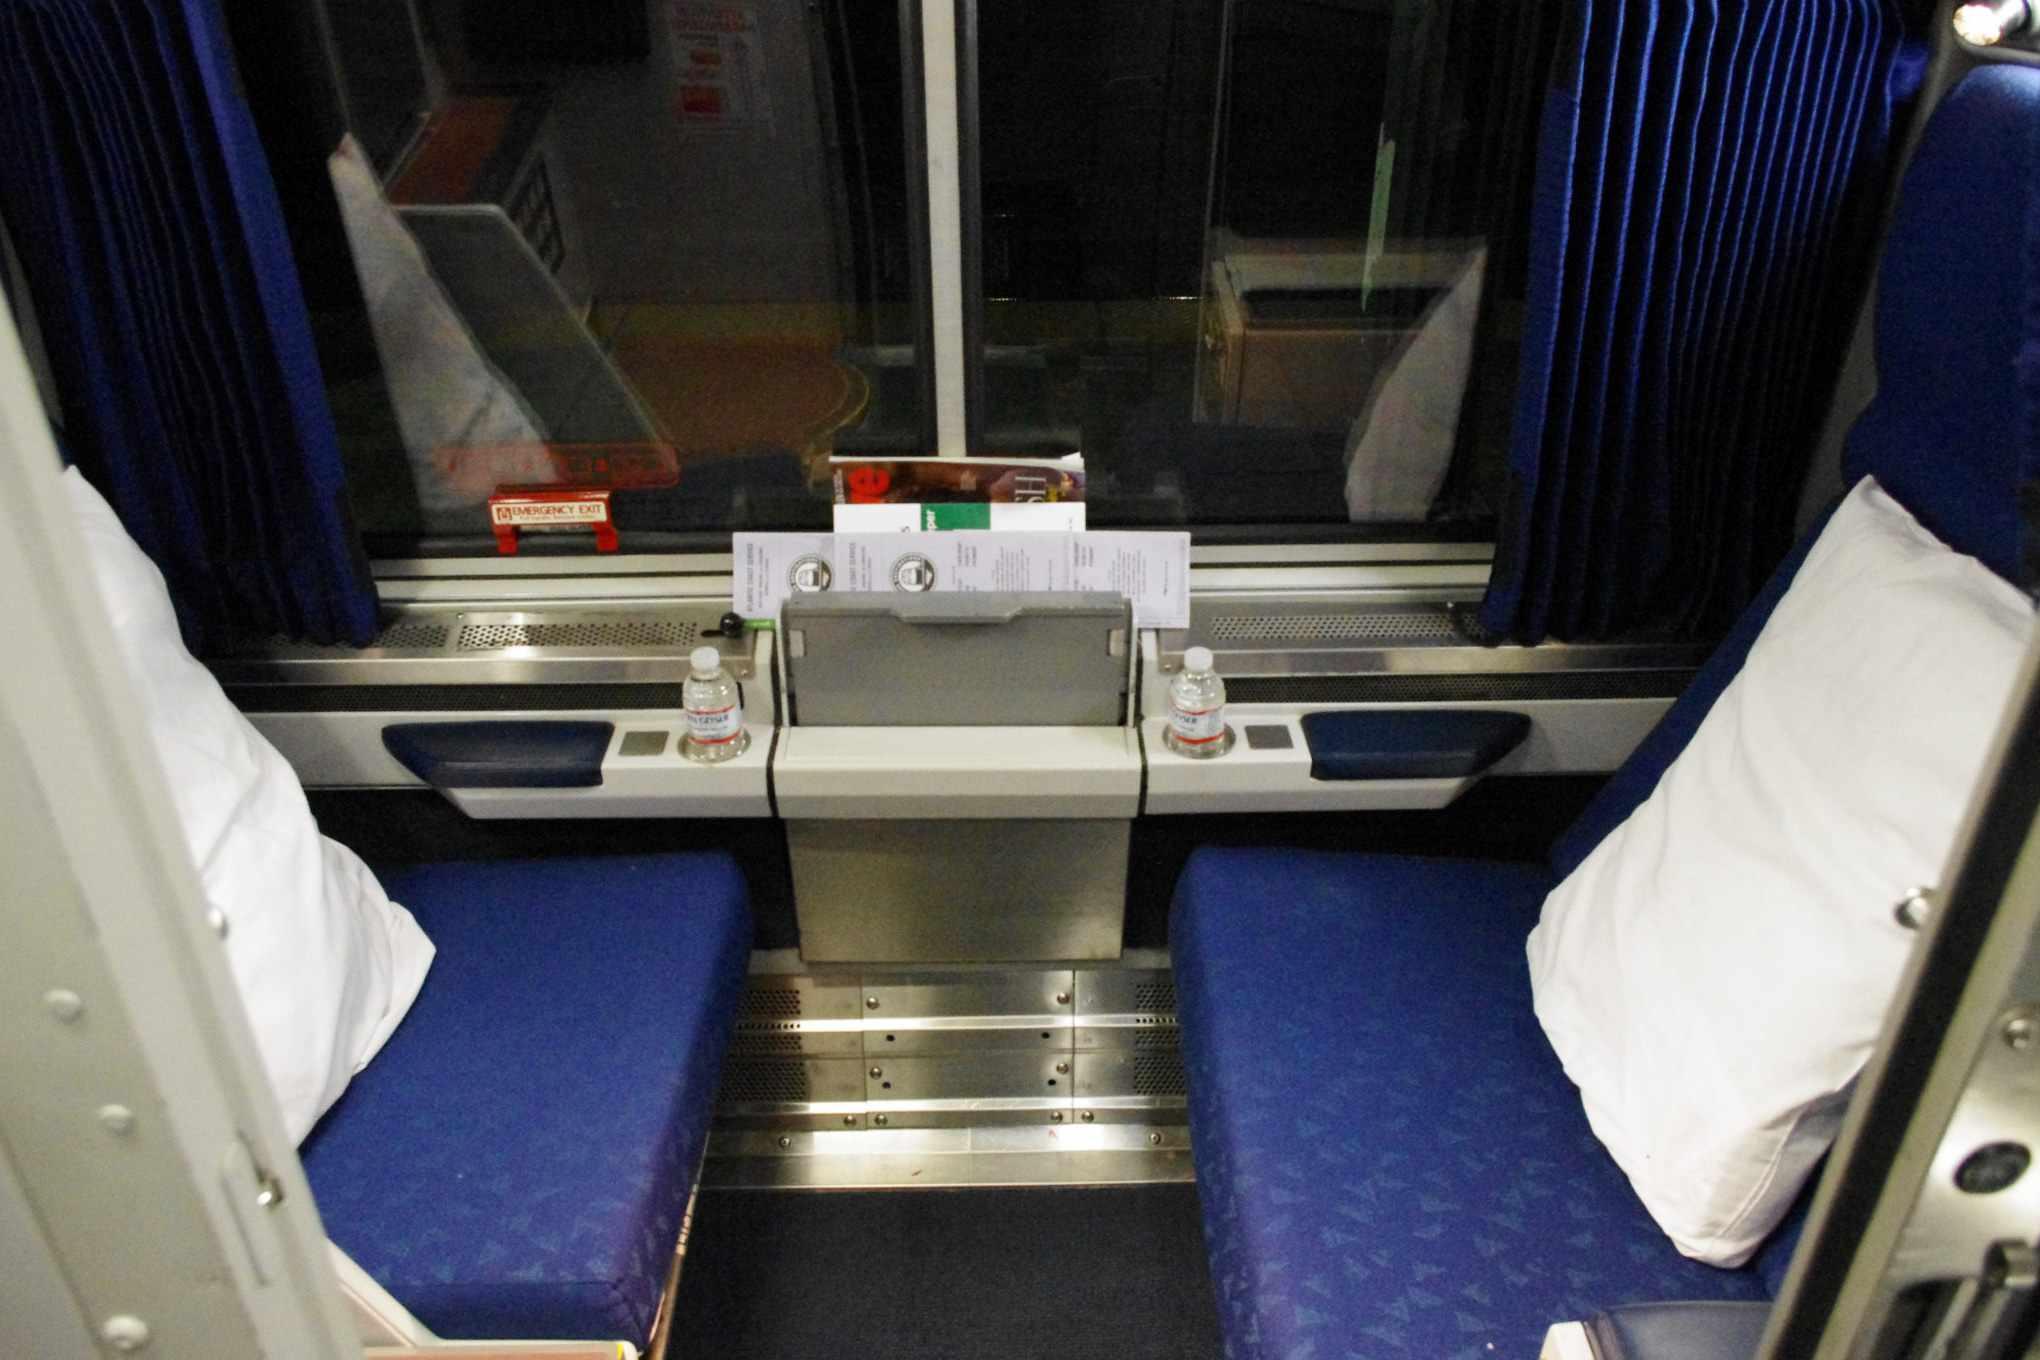 Amtrak Viewliner Roomette